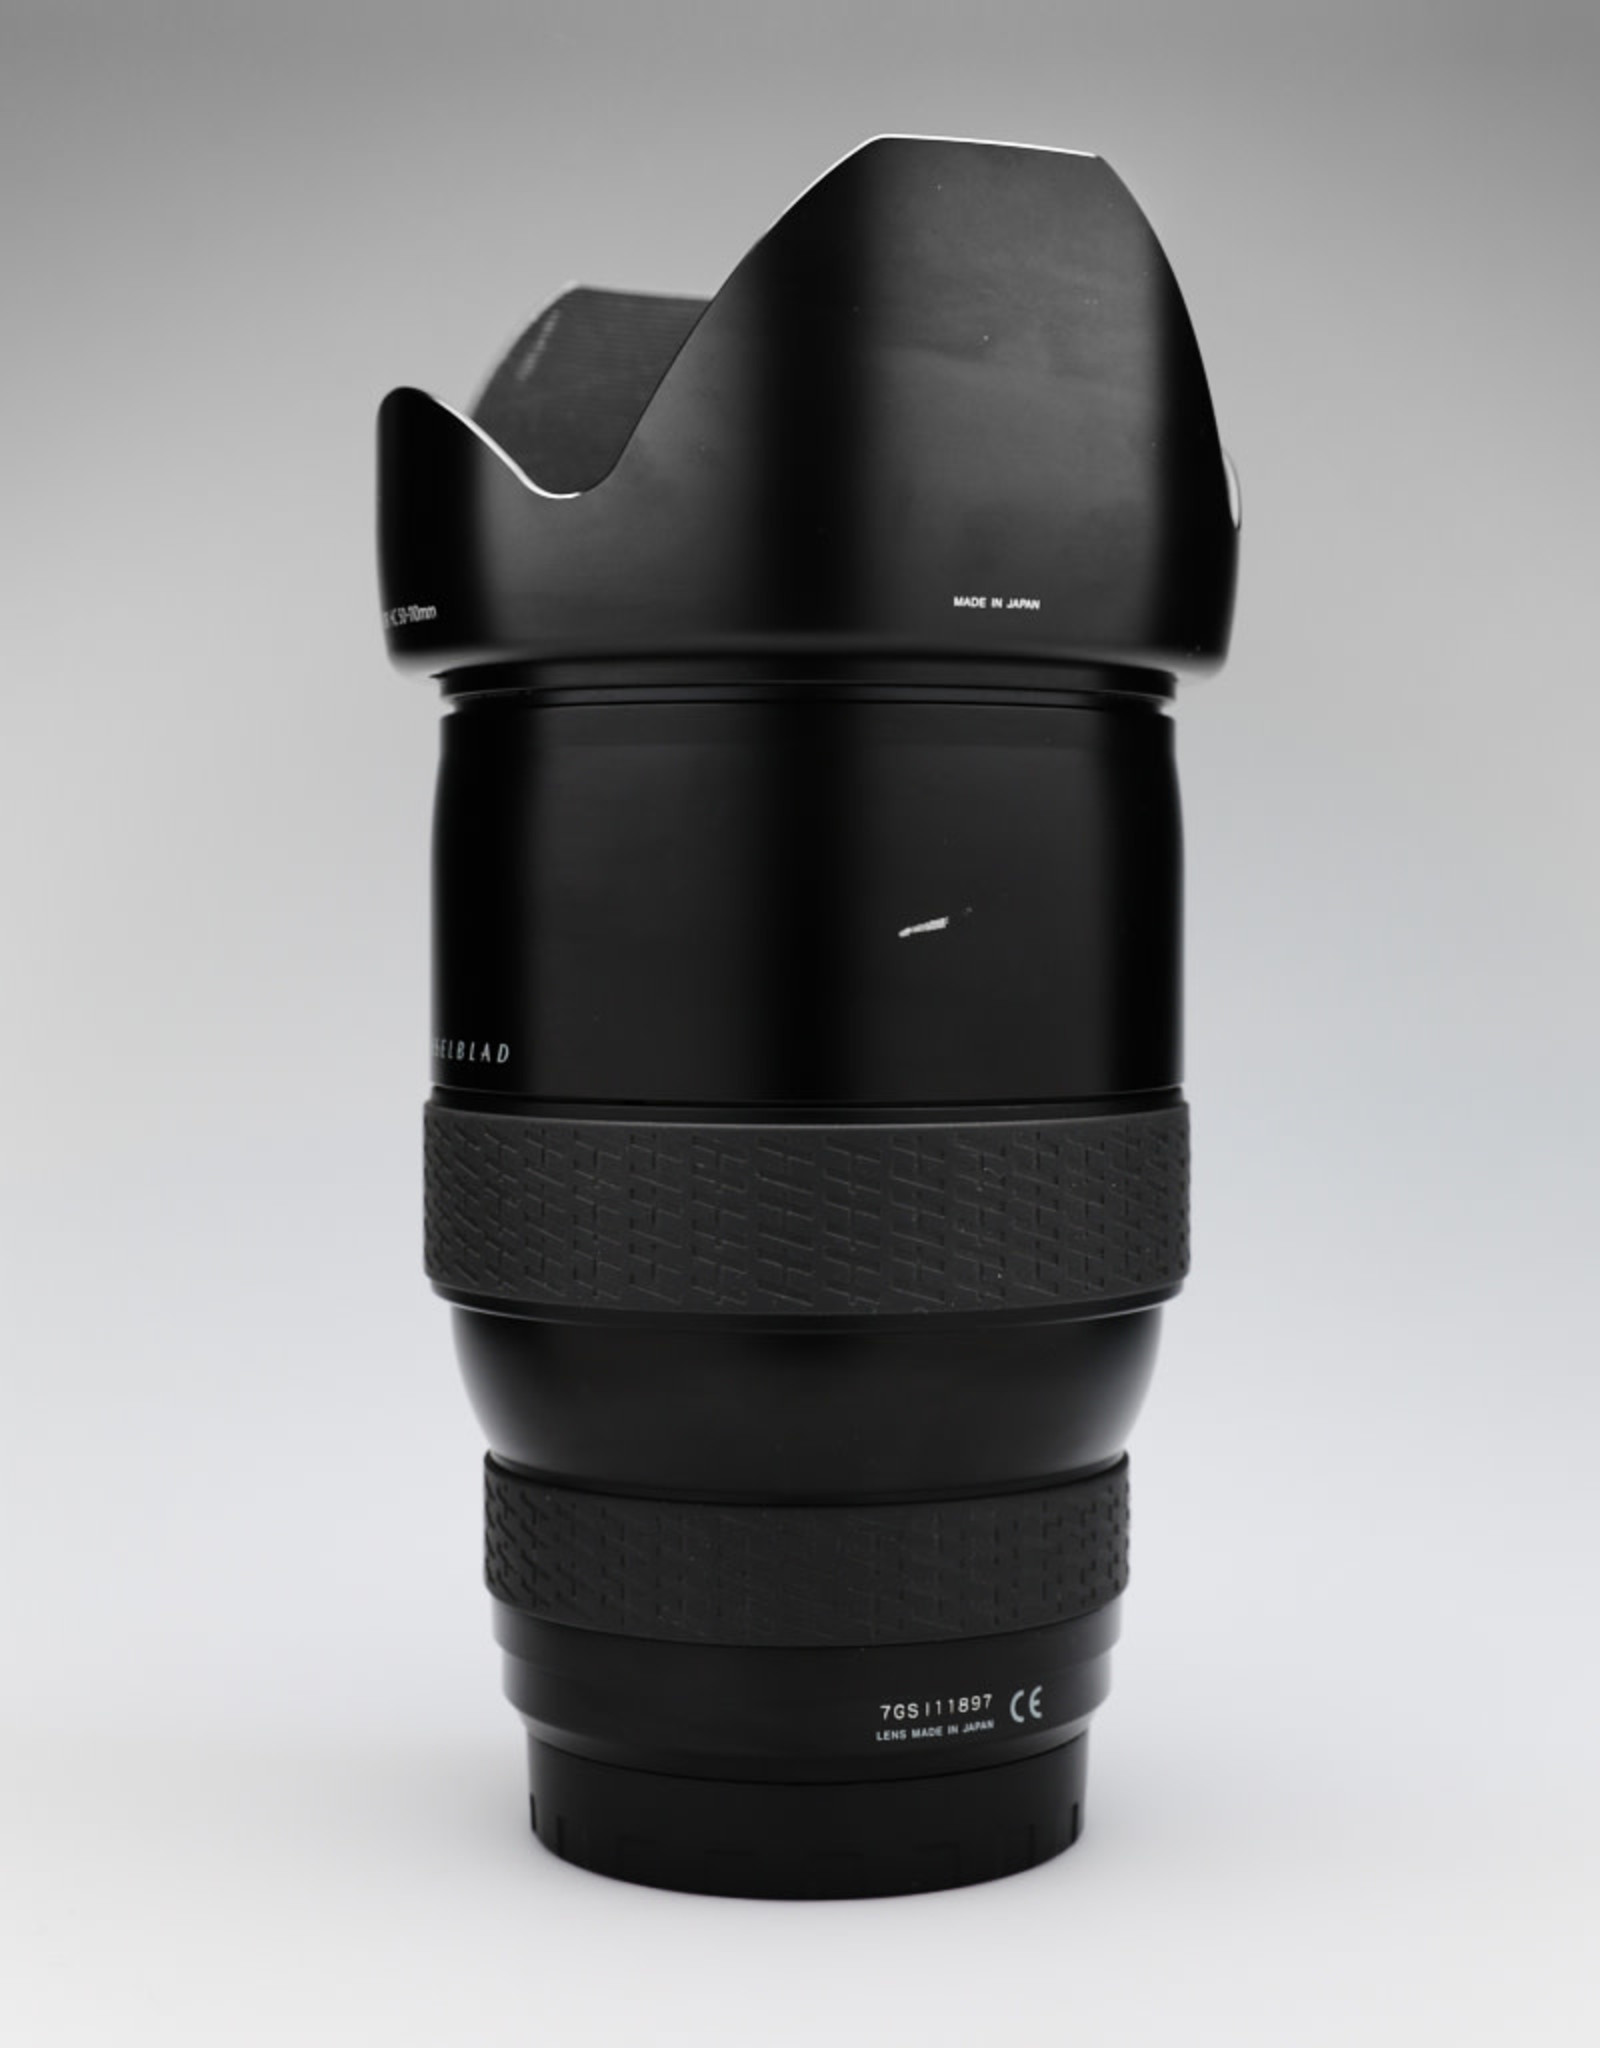 Hasselblad USED  Hasselblad HC 50-110mm F3.5-4.5 Lens